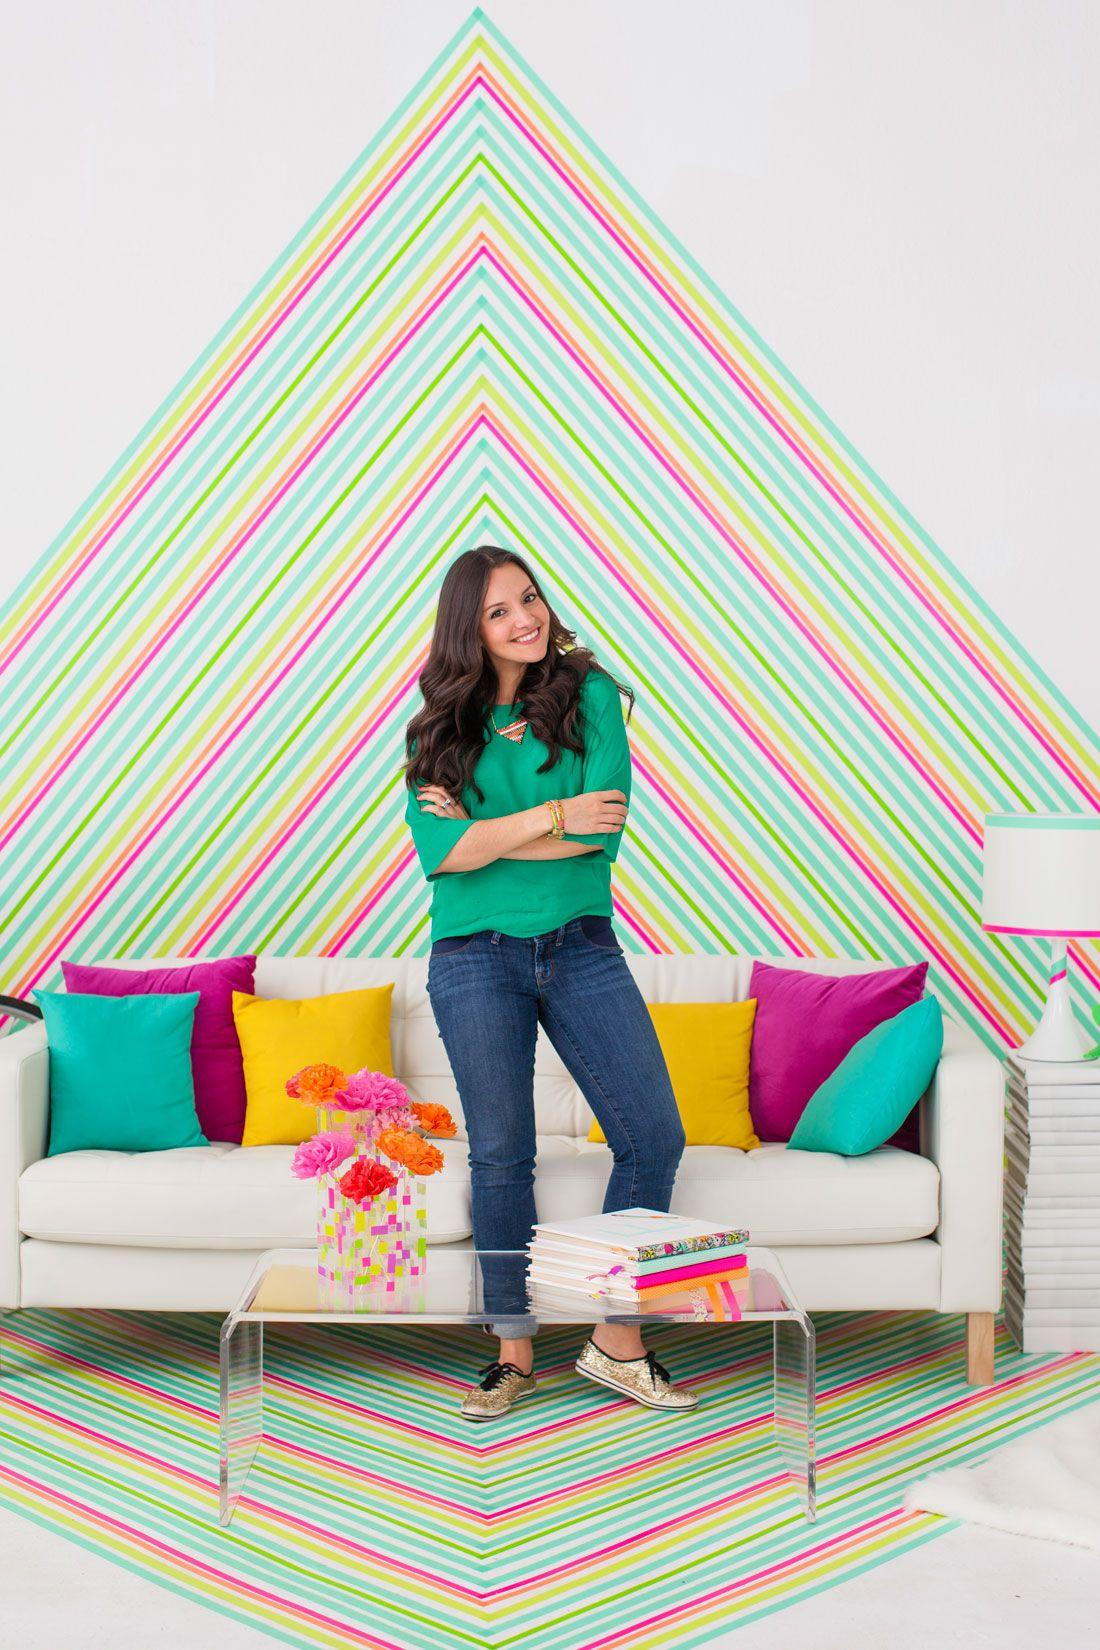 How to DIY Temporary Wallpaper Using Washi Tape | Washi tape, Washi ...